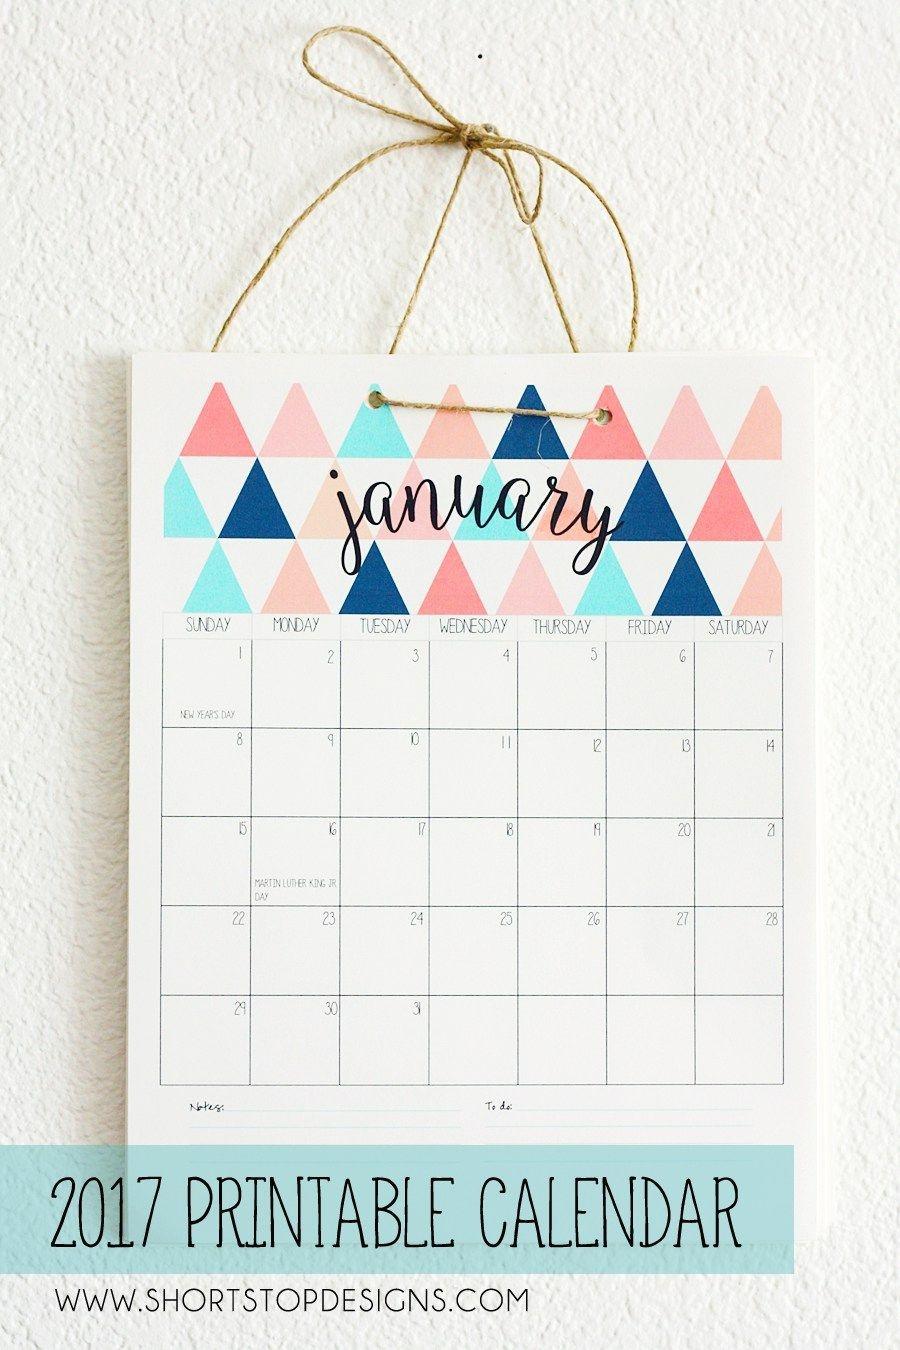 50+ 2017 Free Printable Calendars | Crafty | 2018 Printable Calendar - Free Printable Agenda 2017